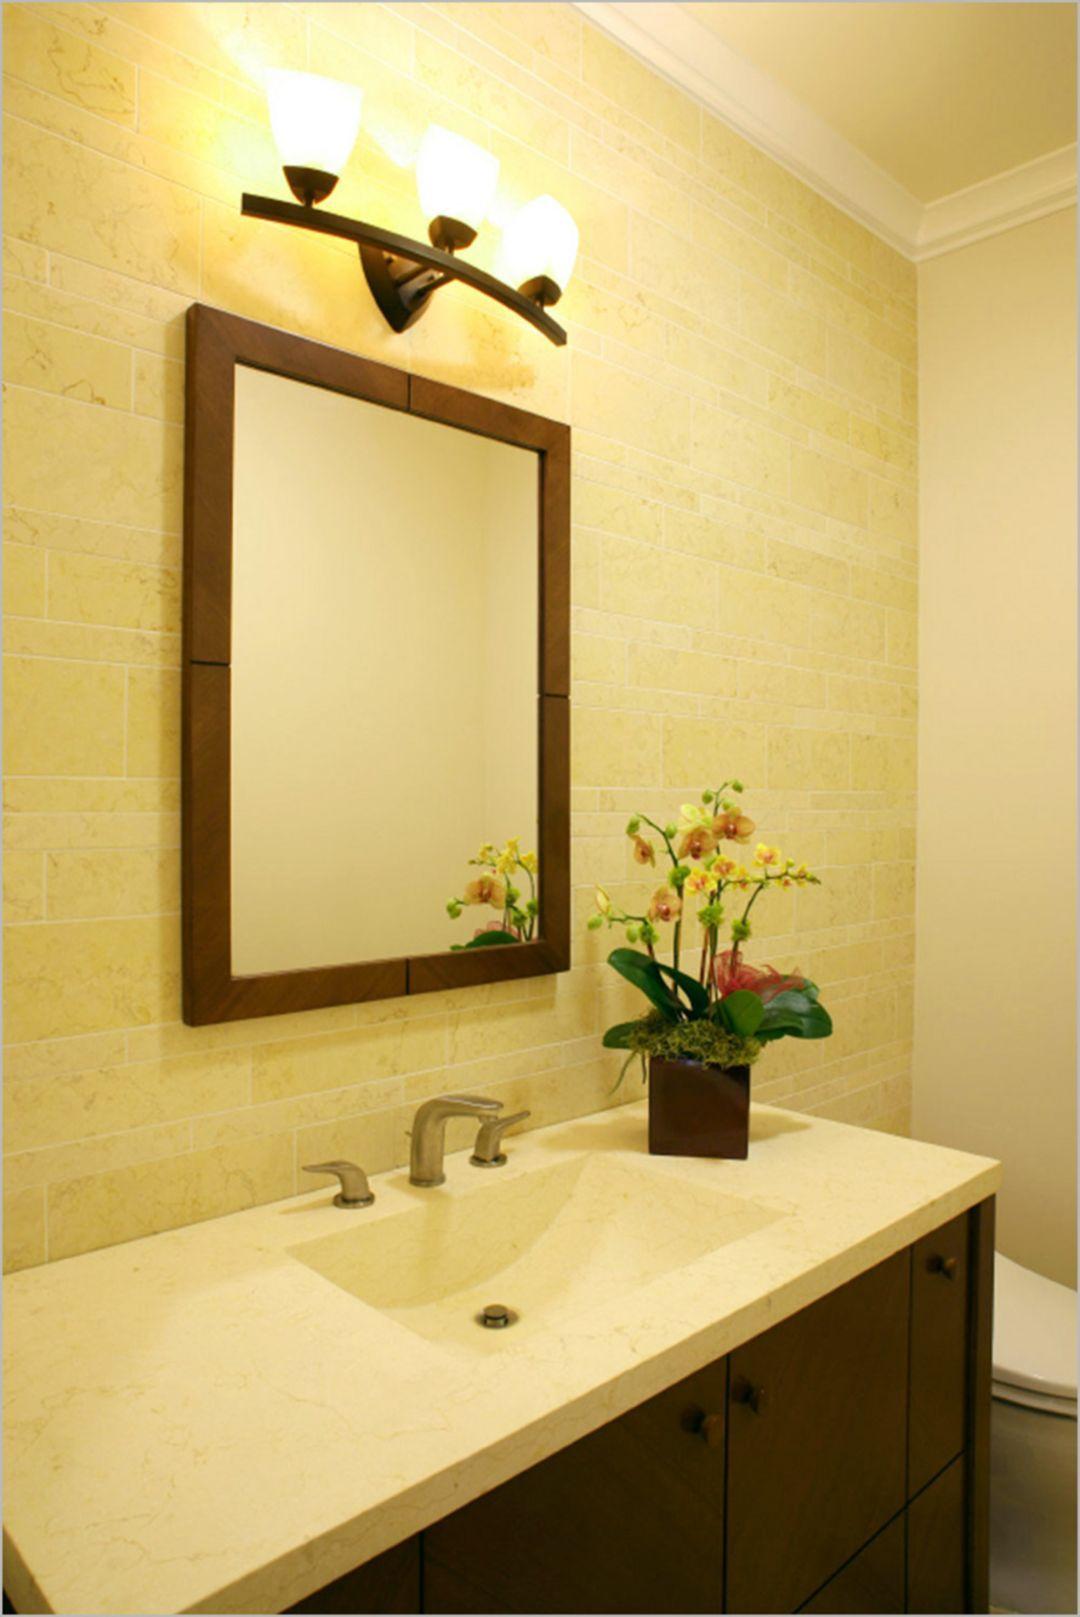 15 Gorgeous Bathroom Light Ideas You Must Know Modern Bathroom Lighting Bathroom Light Fixtures Best Bathroom Lighting